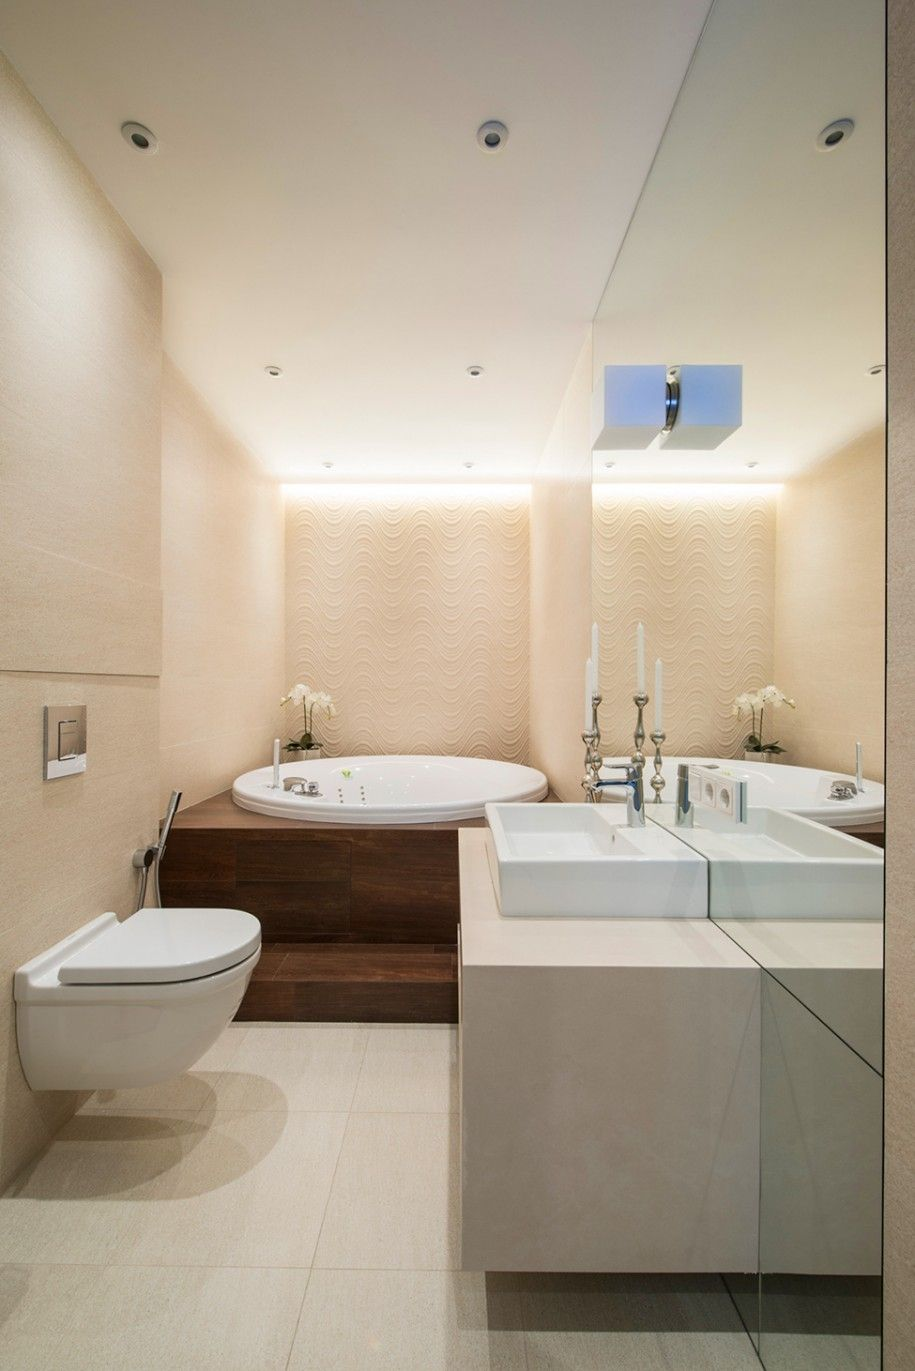 Bathroom designs small bathroom Great Small